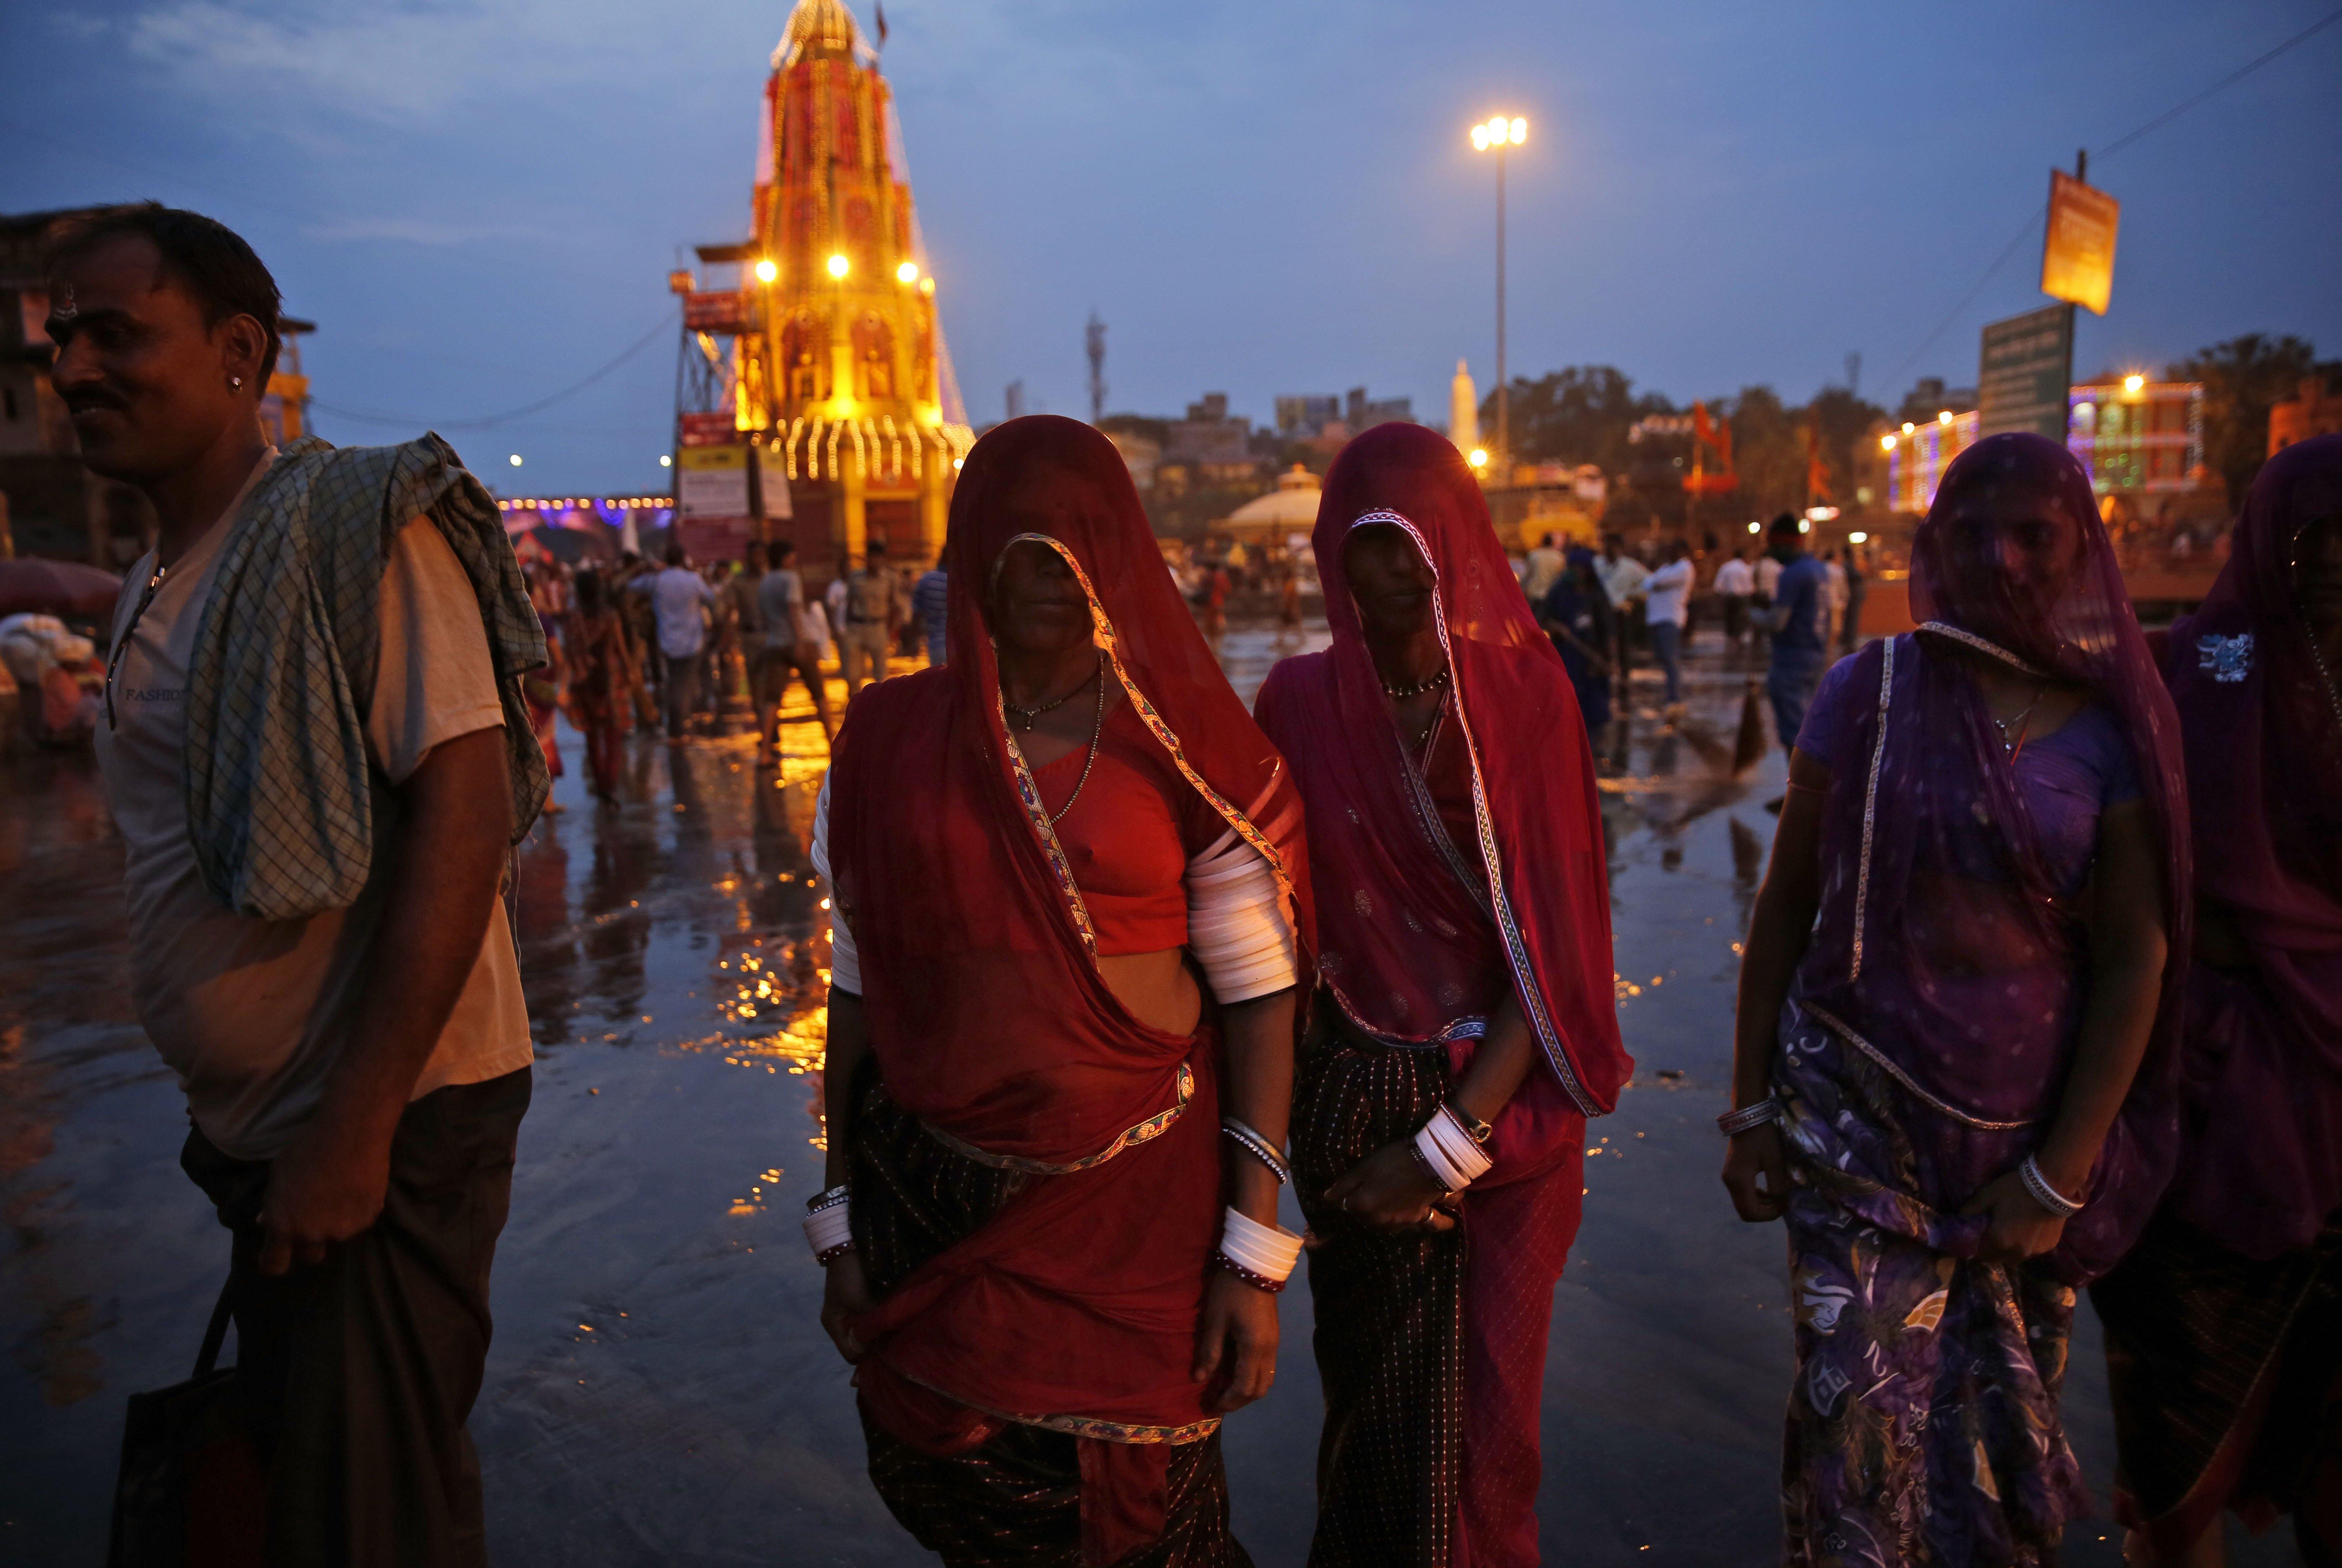 Indian women devotees arrive on the banks of the Godavari River for the second royal bath during Kumbh Mela, or Pitcher Festival in Nasik, India, on Sept. 12, 2015.